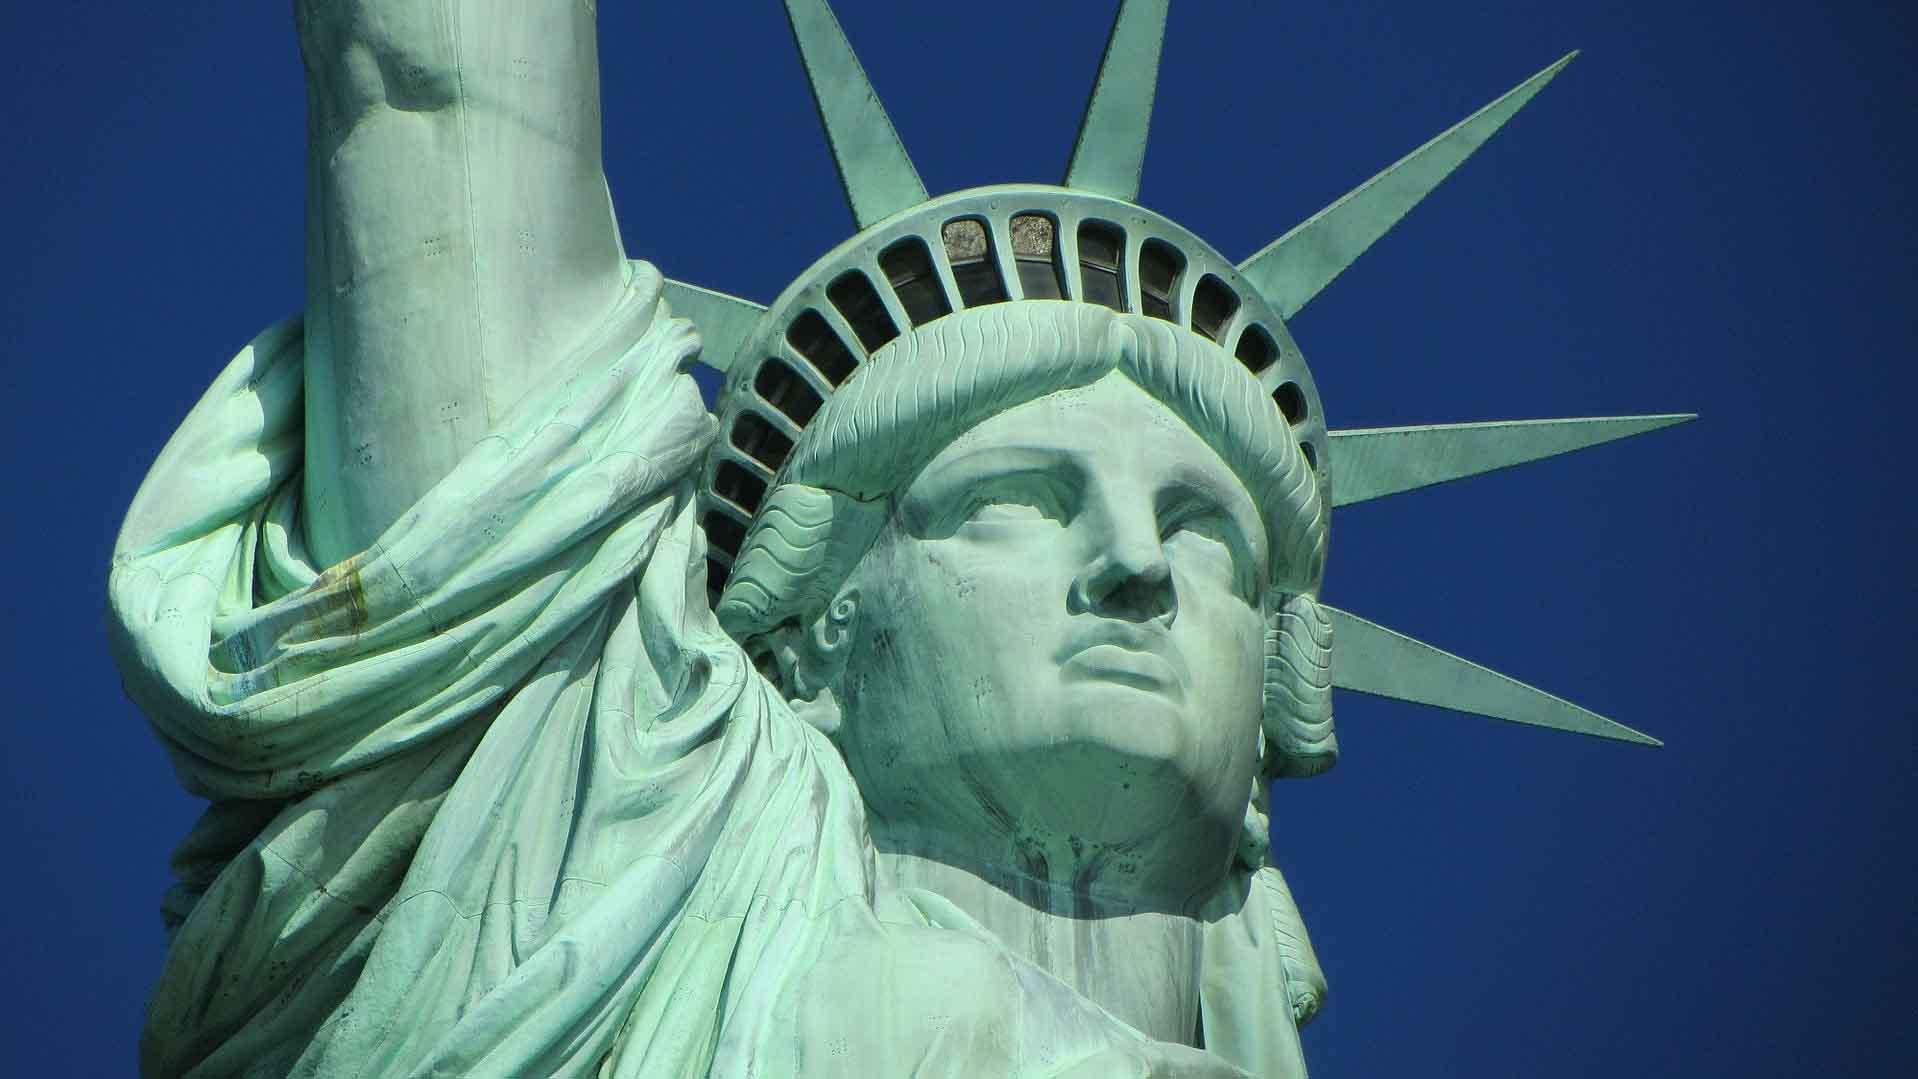 A Closeup of Statue of Liberty - American History